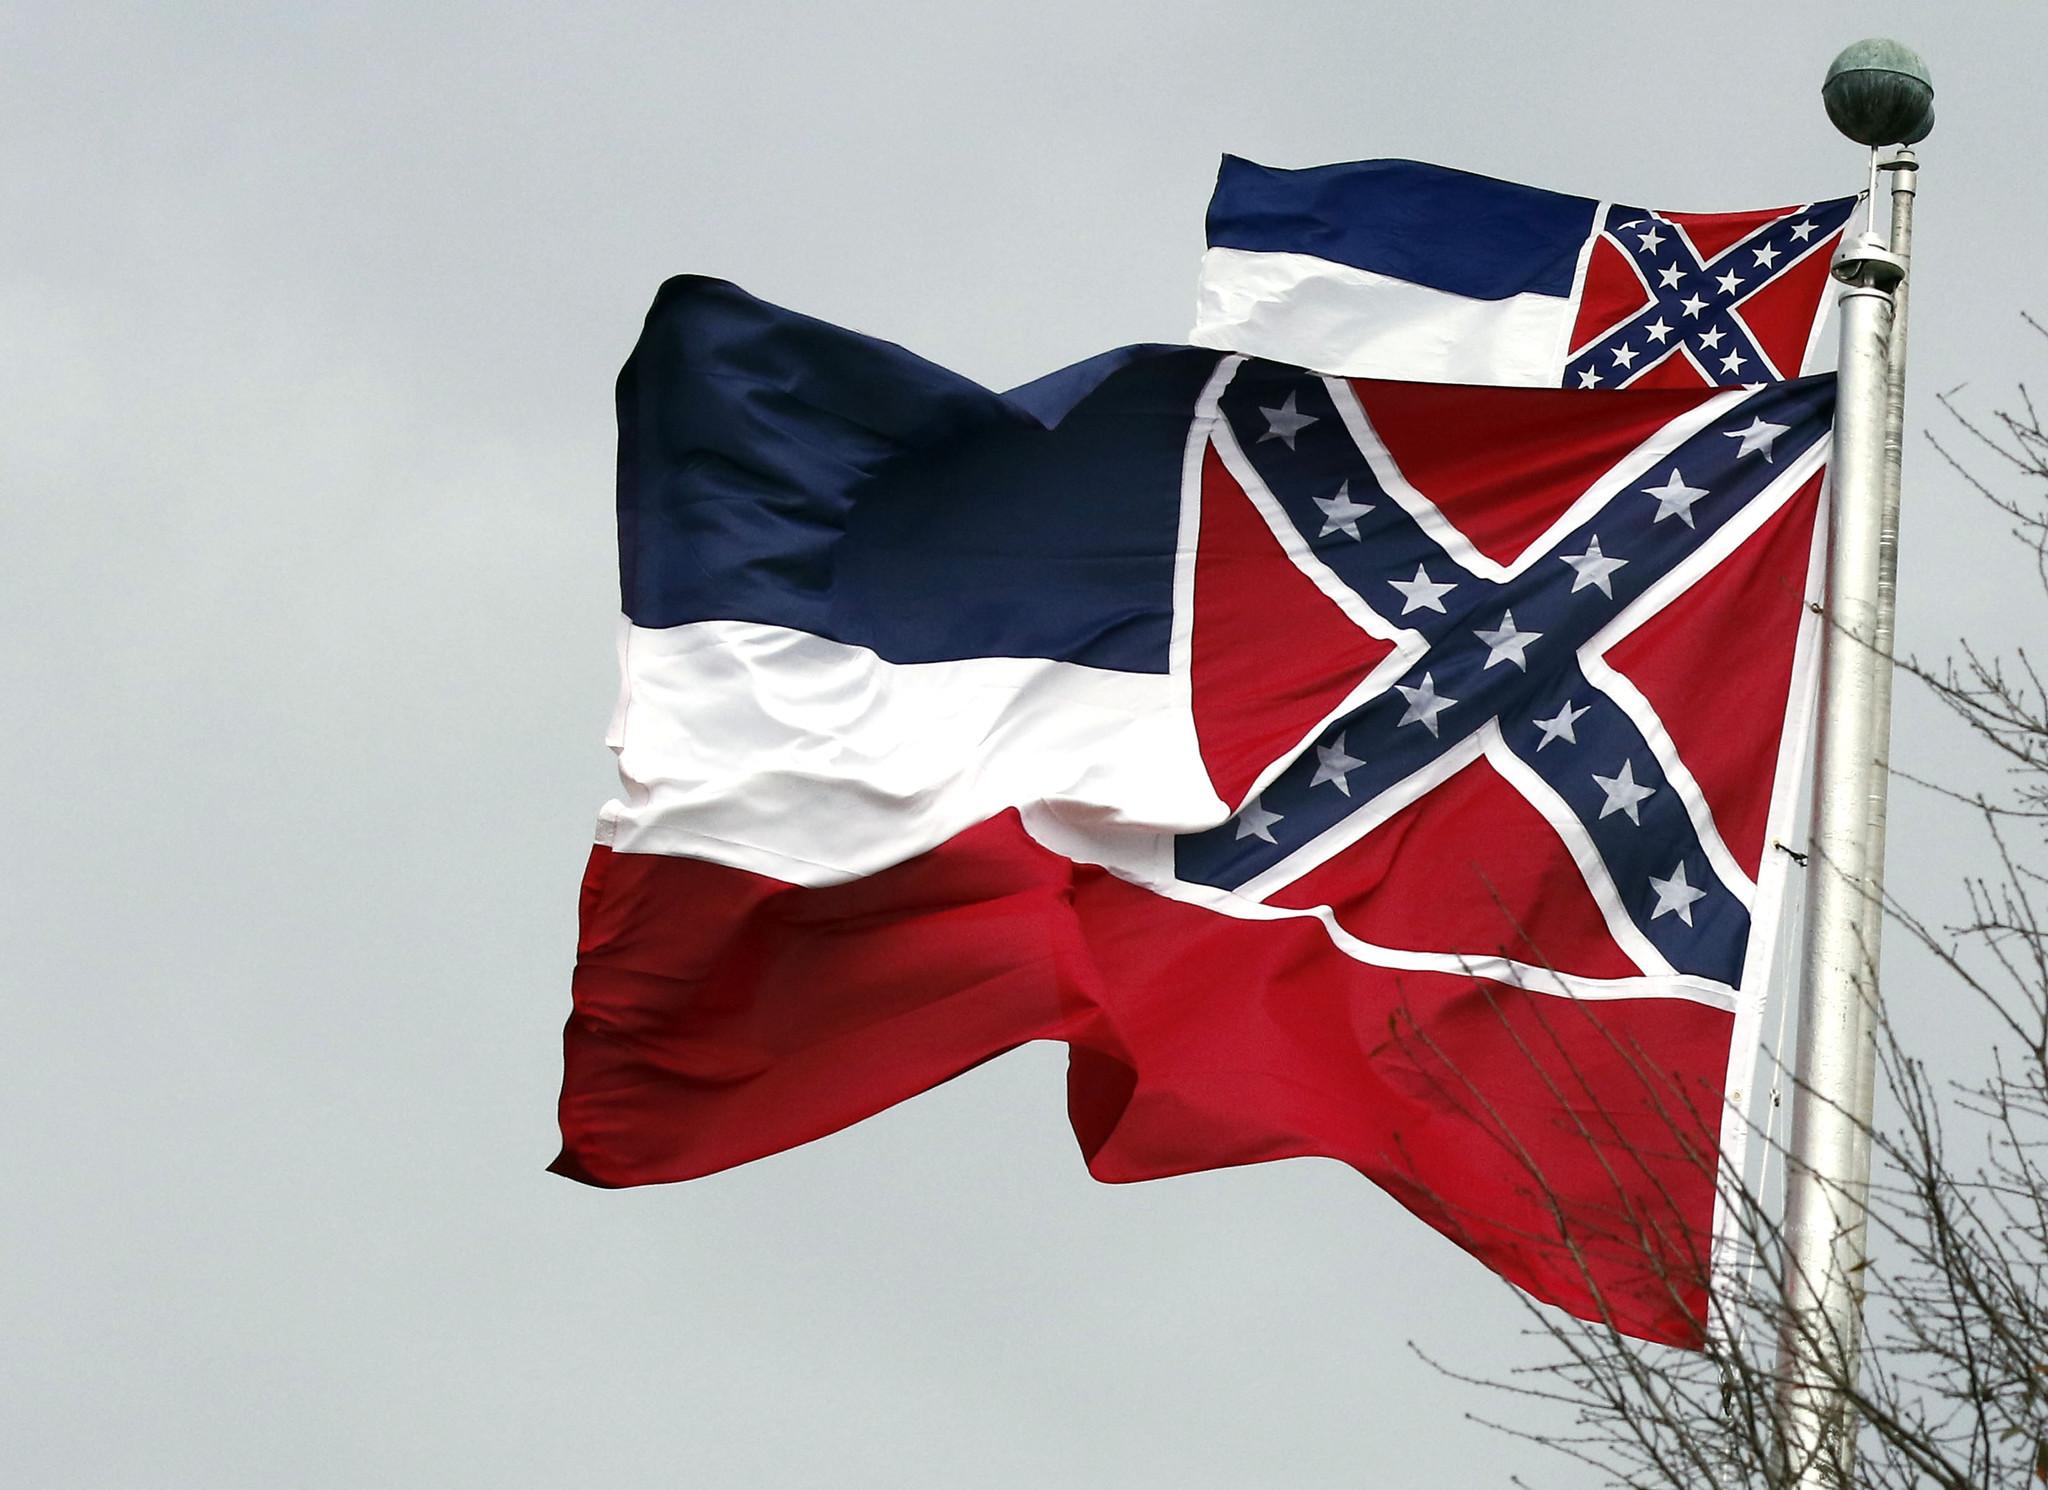 Amid coronavirus pandemic, Mississippi declared April 'Confederate Heritage Month'